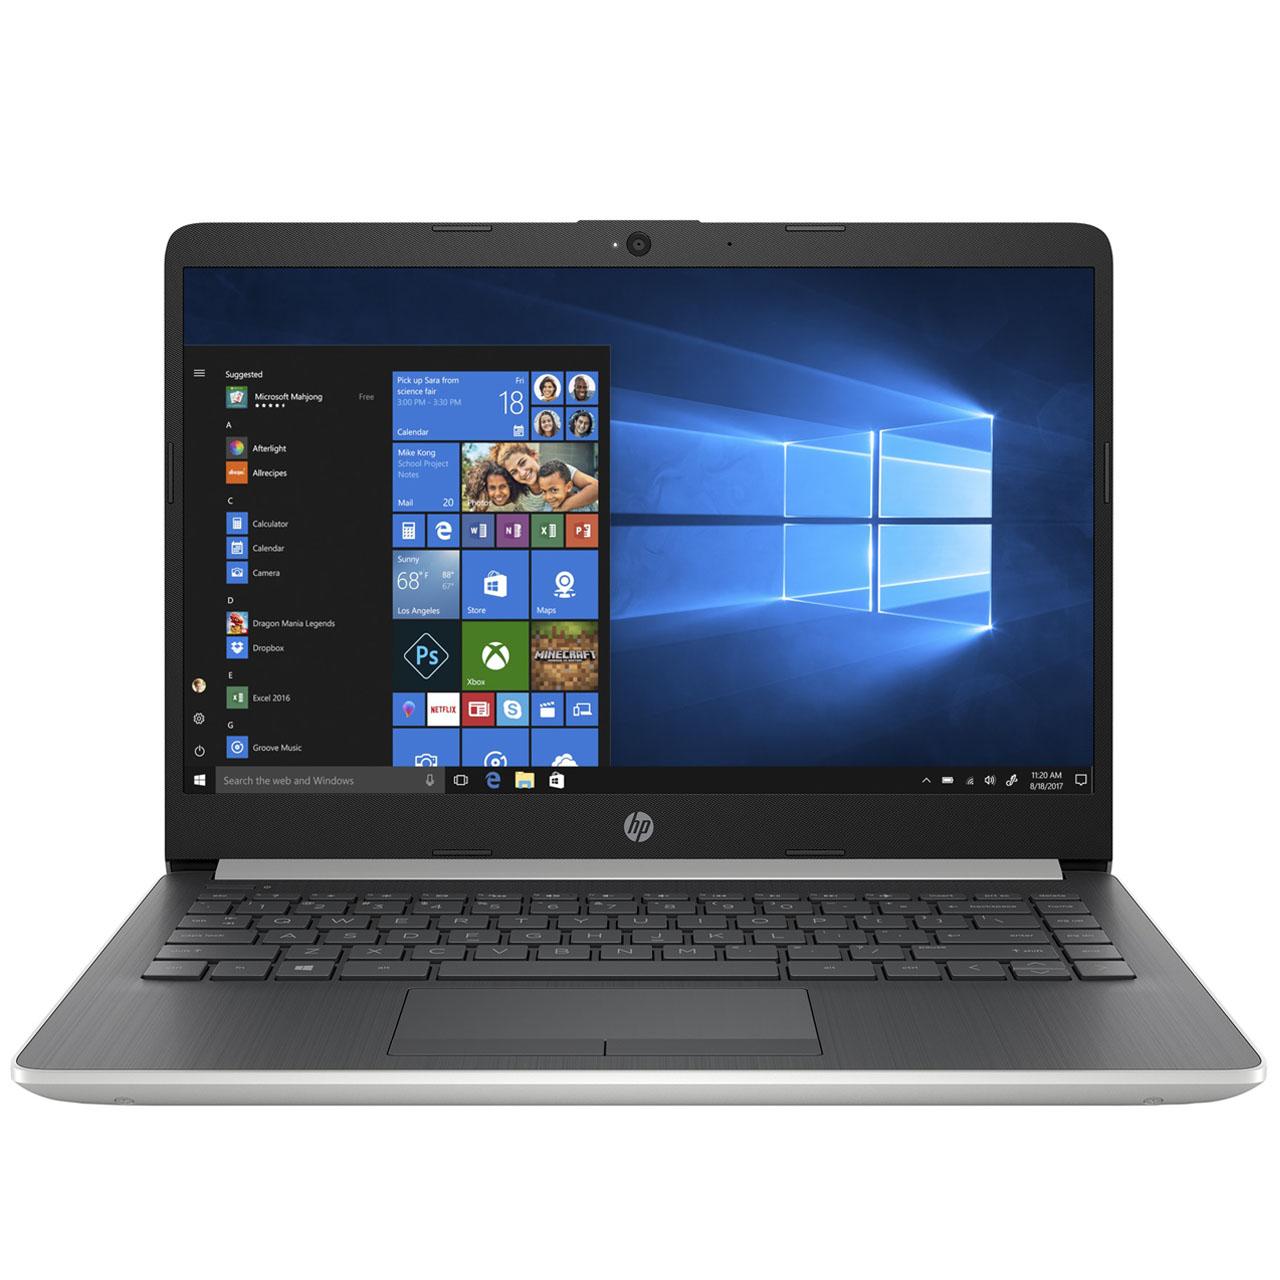 لپ تاپ 15 اینچی اچ پی مدل DA0115nia - PA